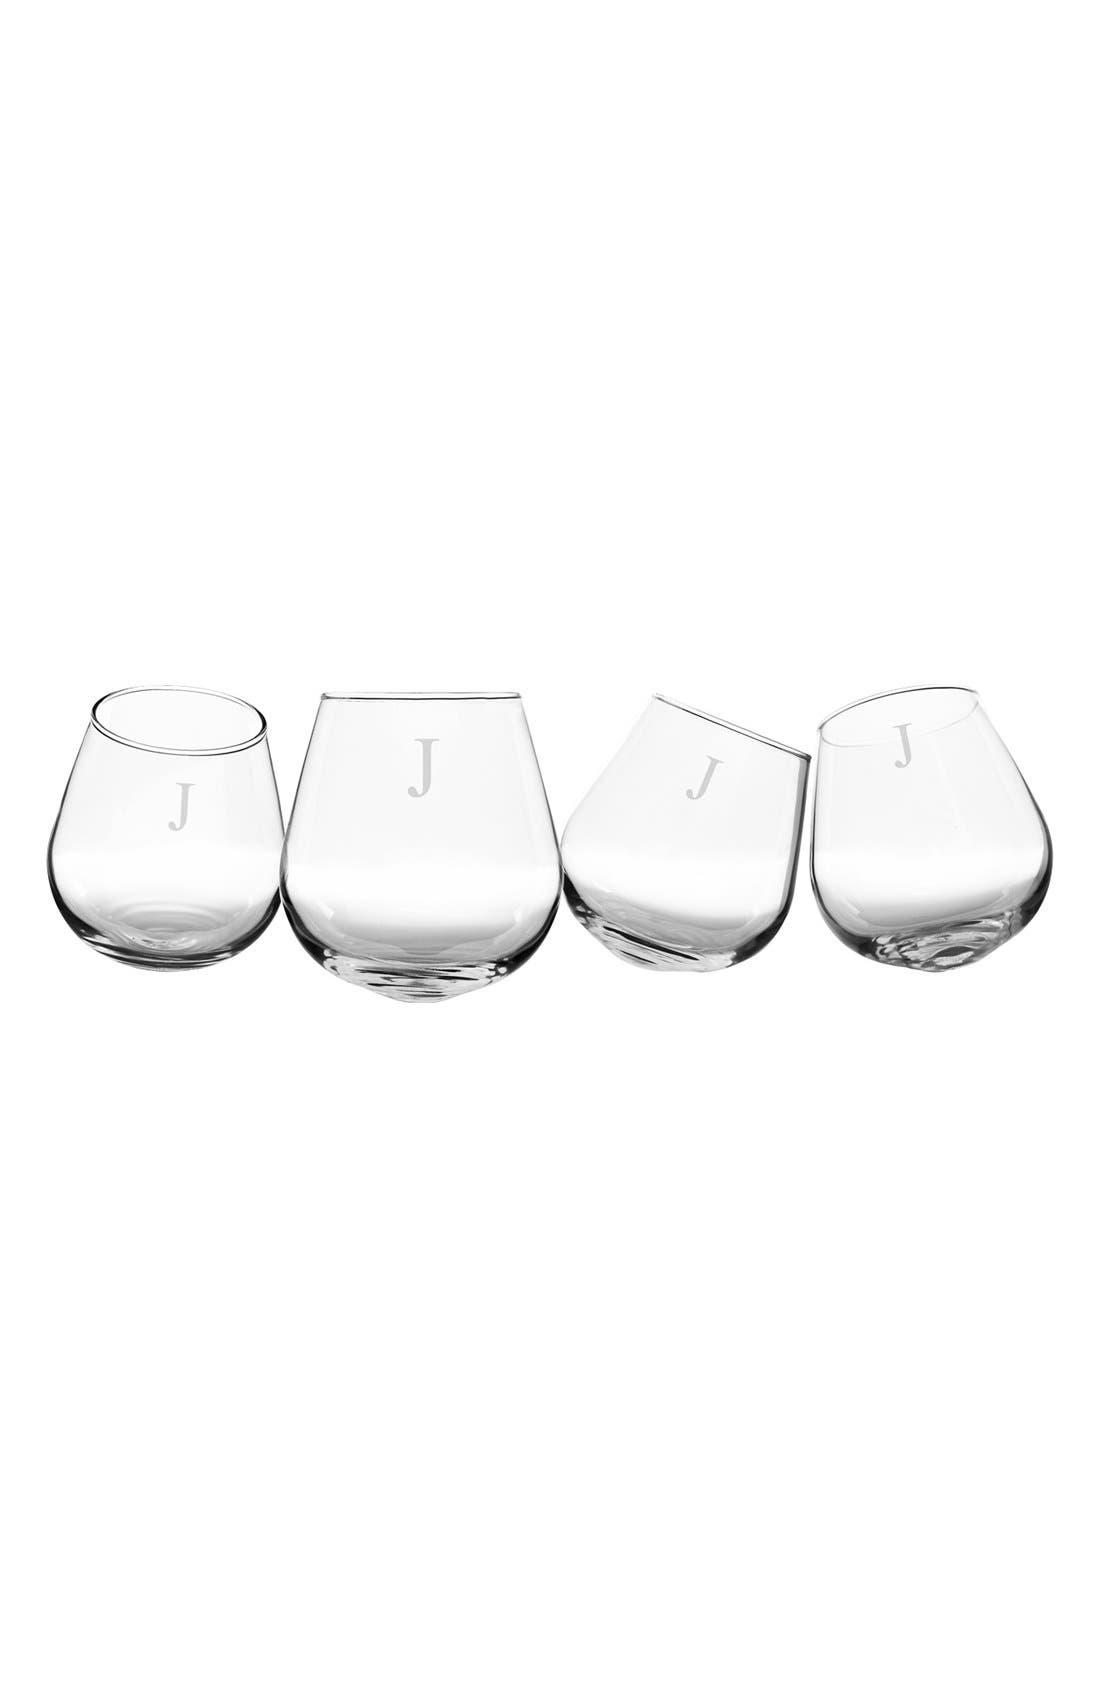 Monogram Tipsy Set of 4 Wine Glasses,                             Main thumbnail 1, color,                             CLEAR J